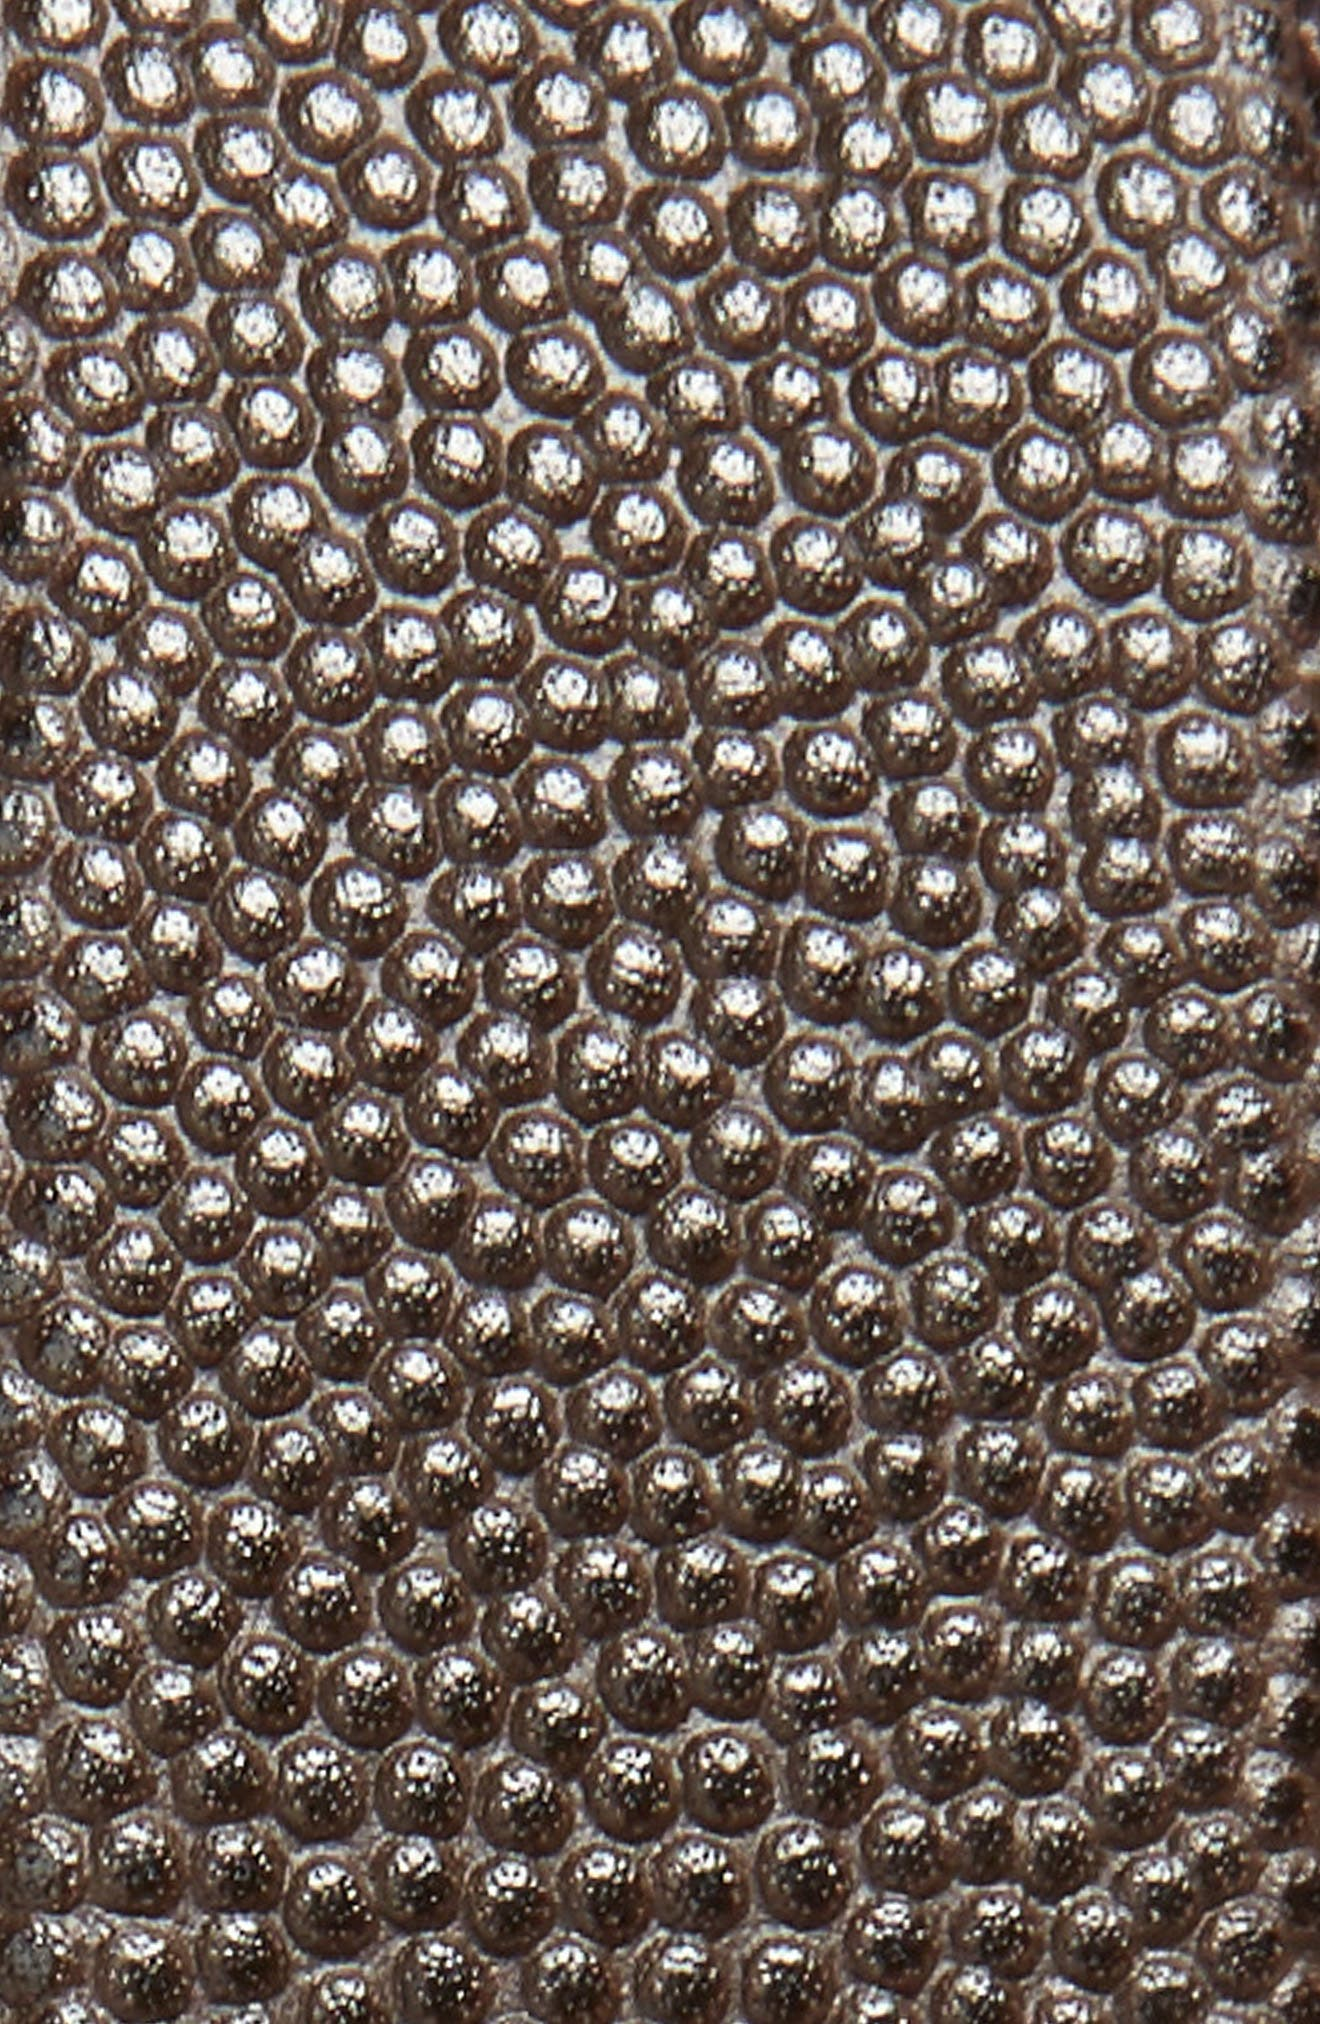 SALVATORE FERRAGAMO, Salvatore Ferragaom Reversible Leather Belt, Alternate thumbnail 3, color, CHOCOLATE/ BLACK